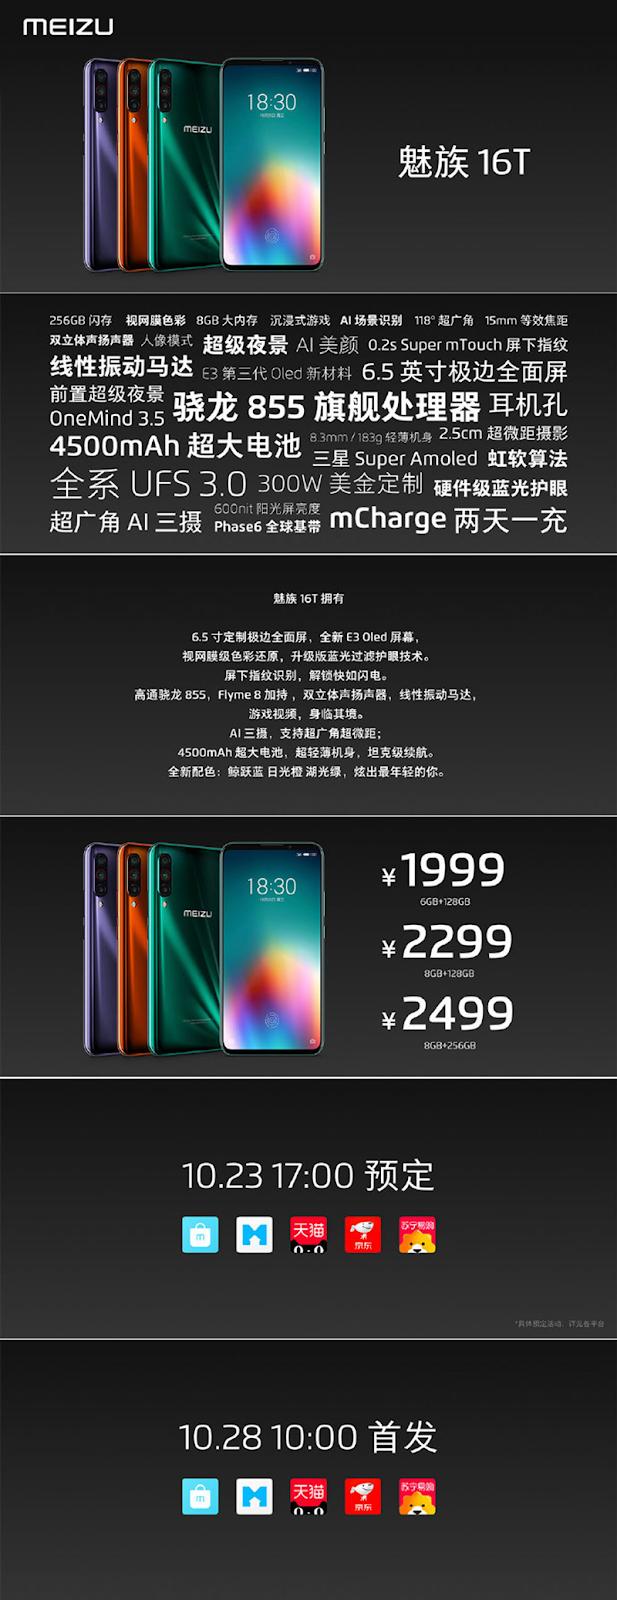 Meizu 16T highlights